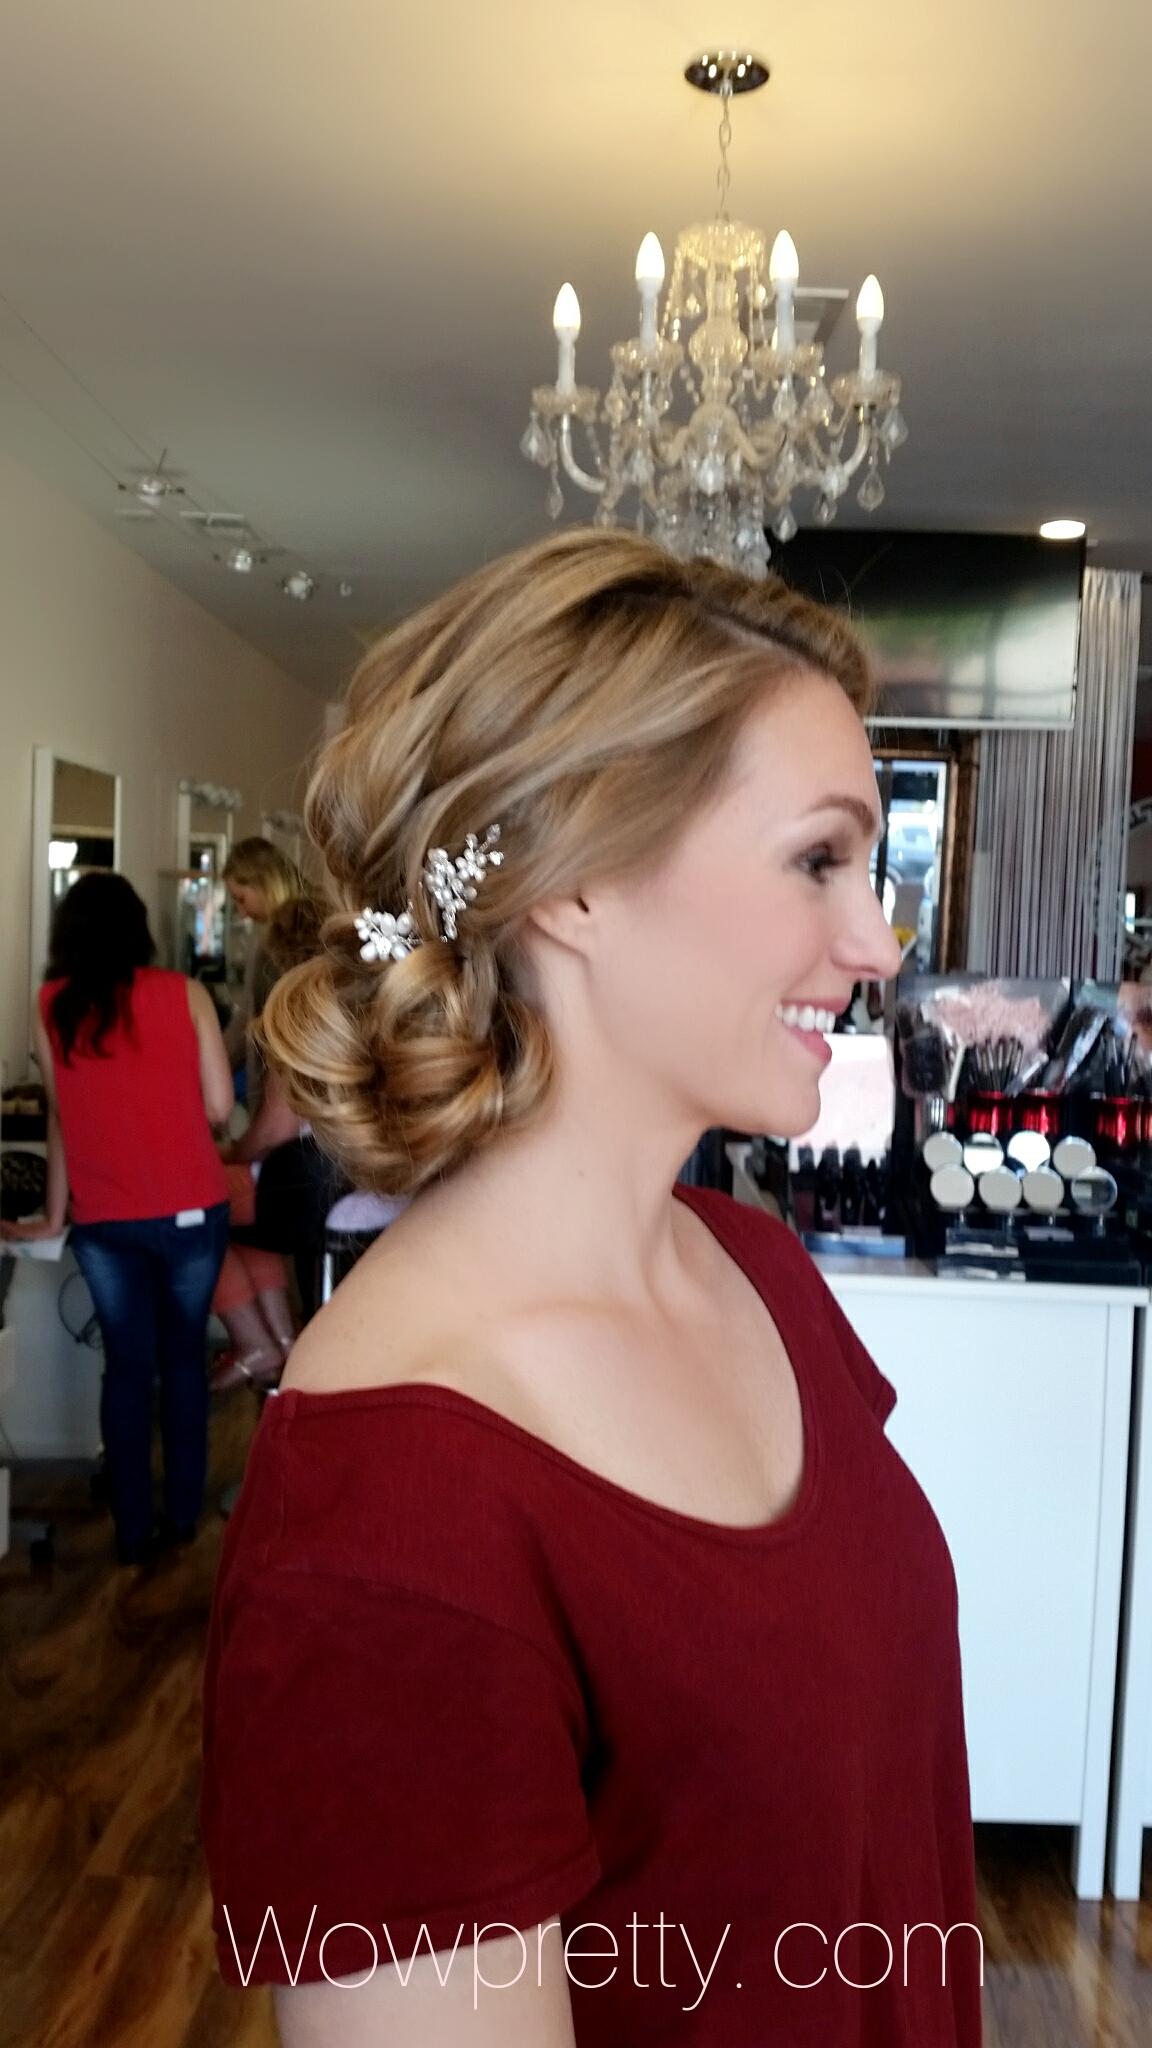 wedding-trial-makeup-and-hair_26825356912_o.jpg